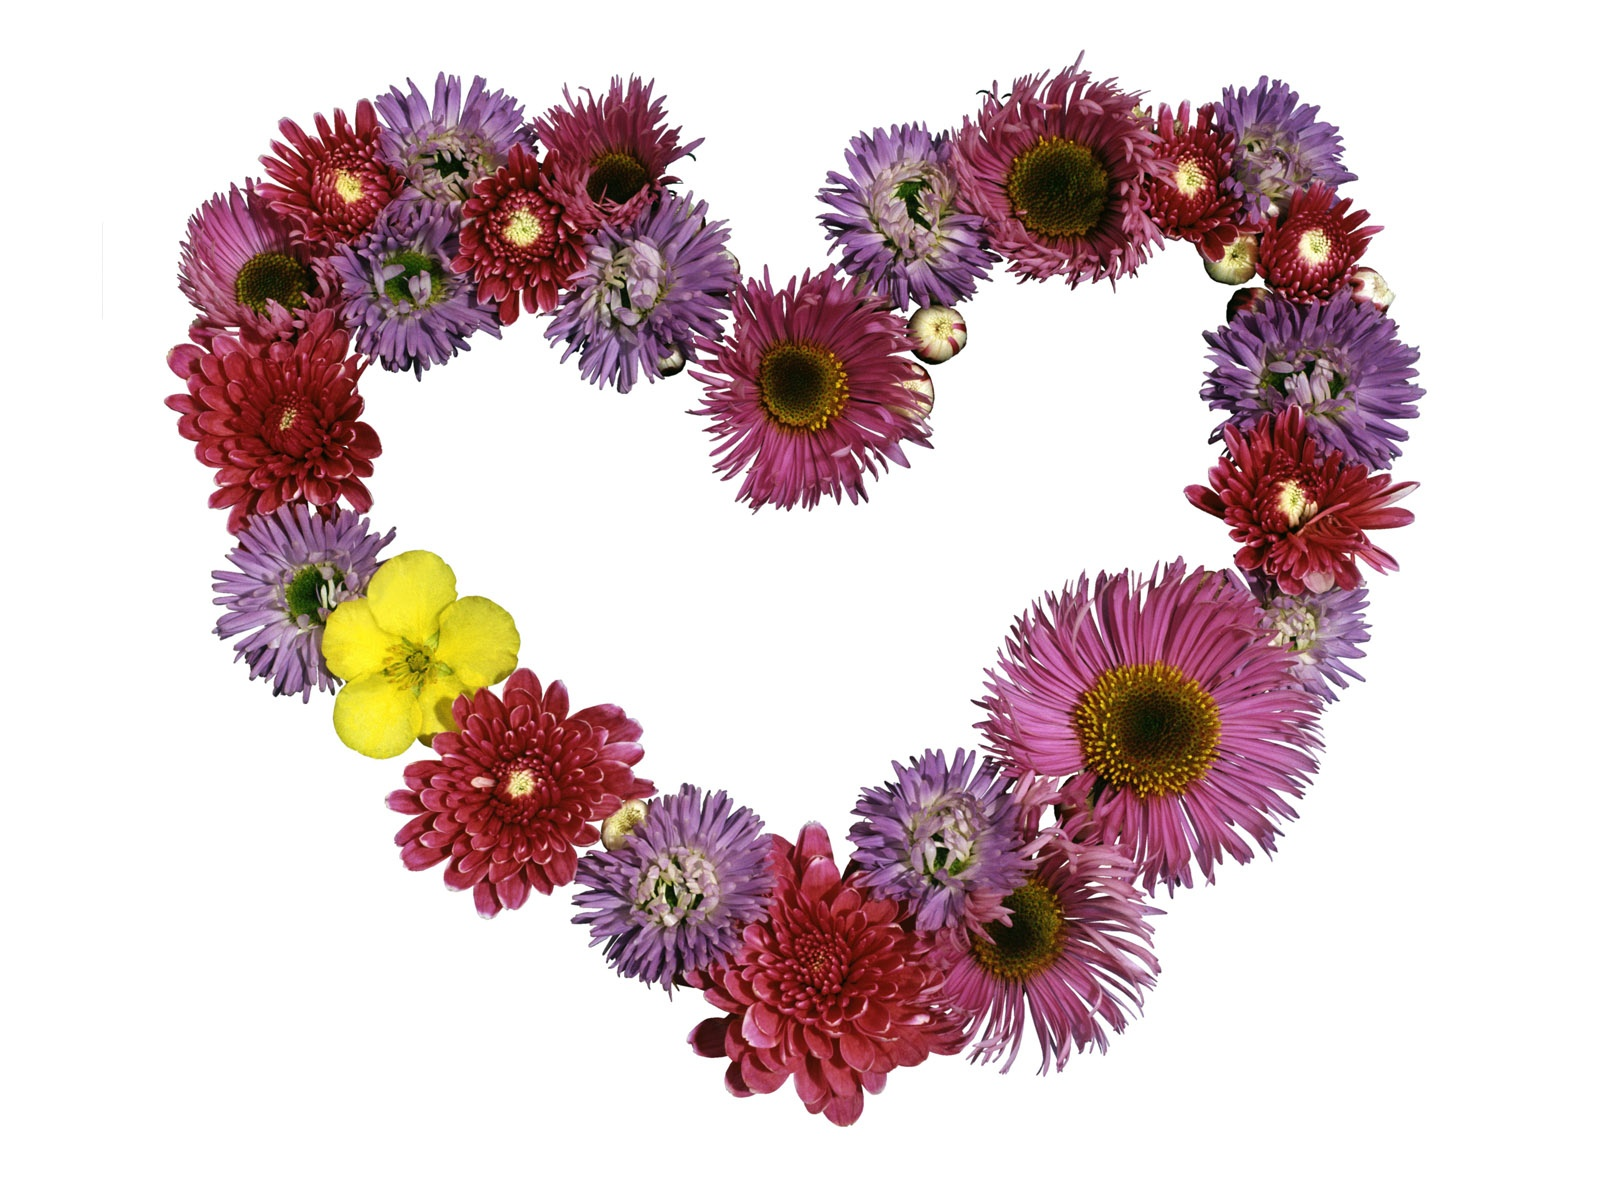 Fondo de pantalla de un corazón hecho de muchas flores diferentes.